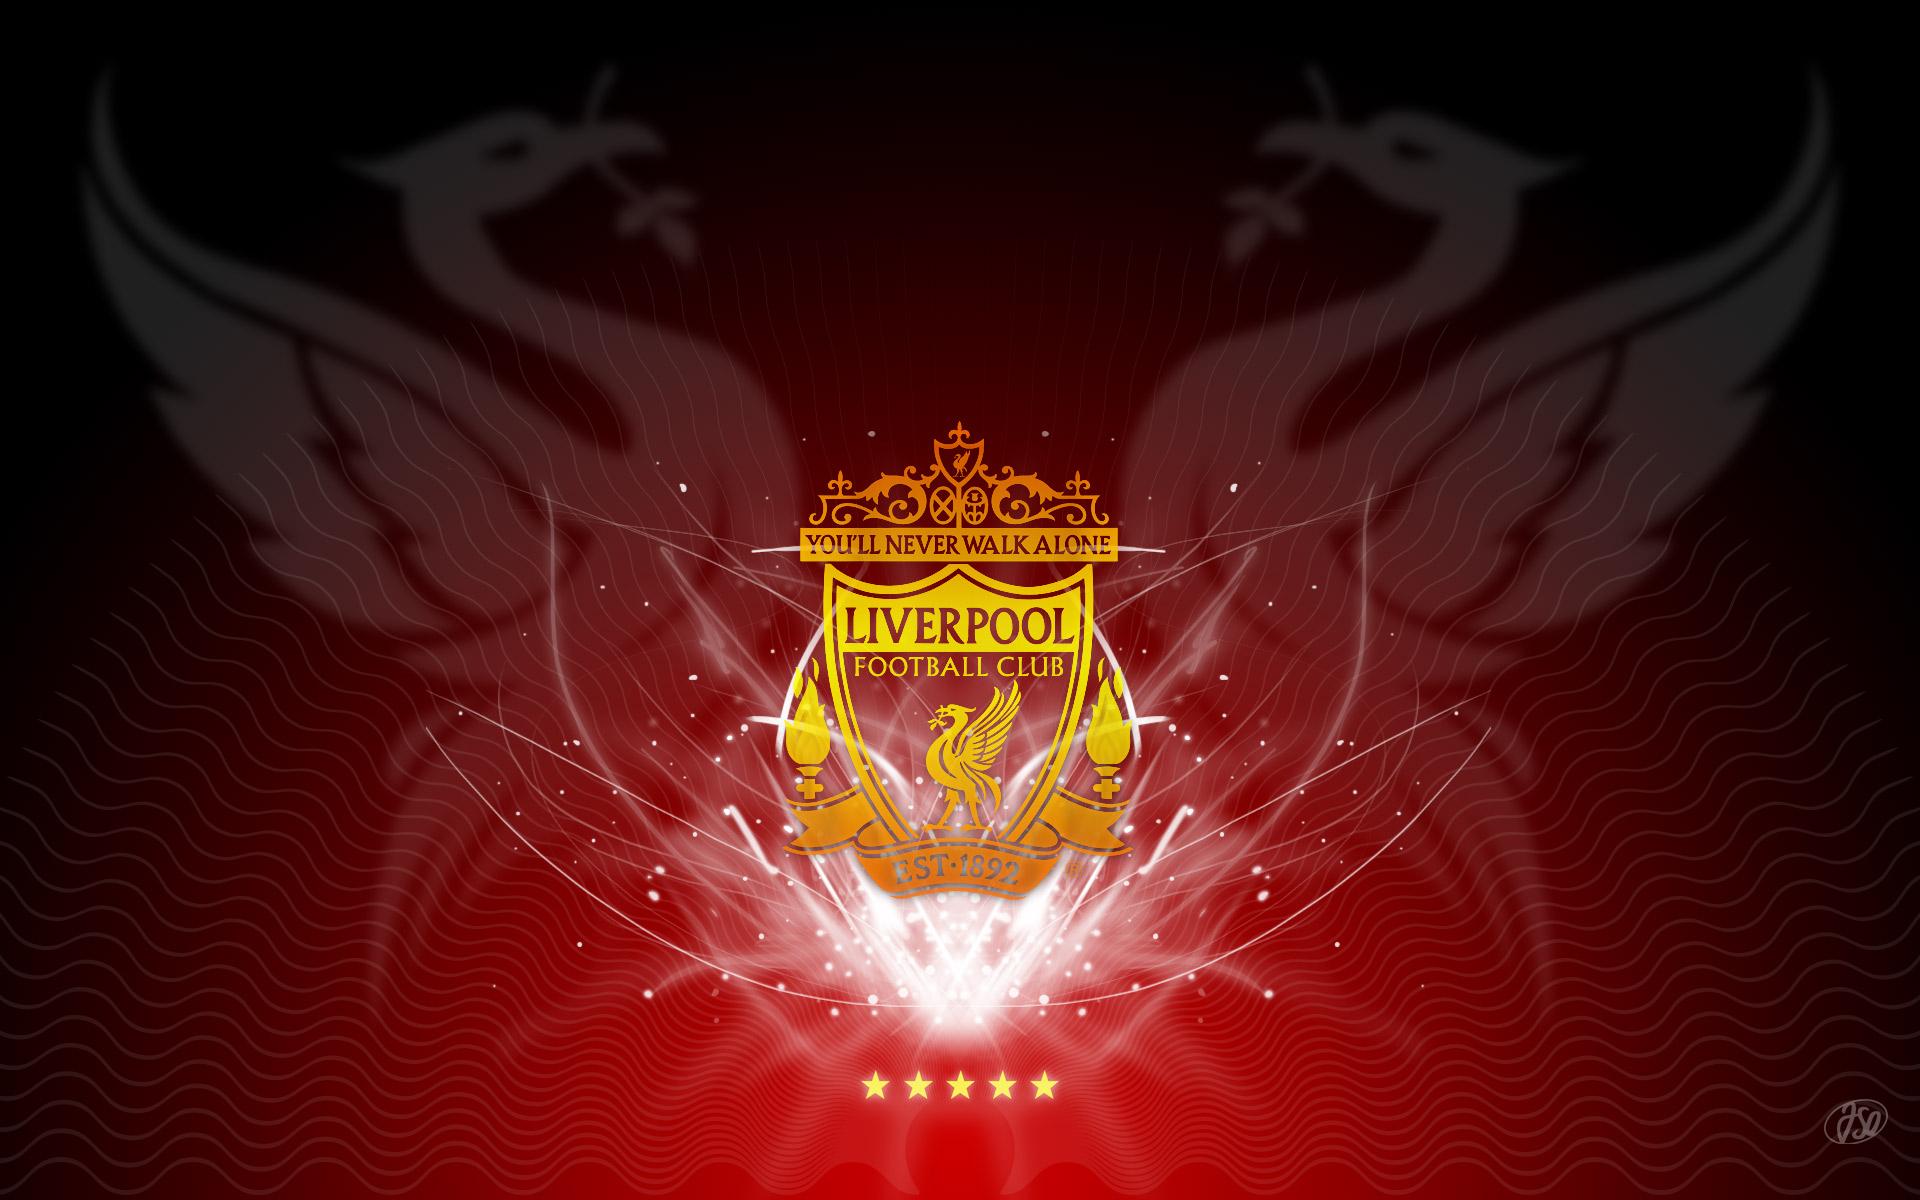 Awesome Liverpool FC Wallpaper That Will Energize Any Desktop   Thomas. Lfc Wallpaper   WallpaperSafari